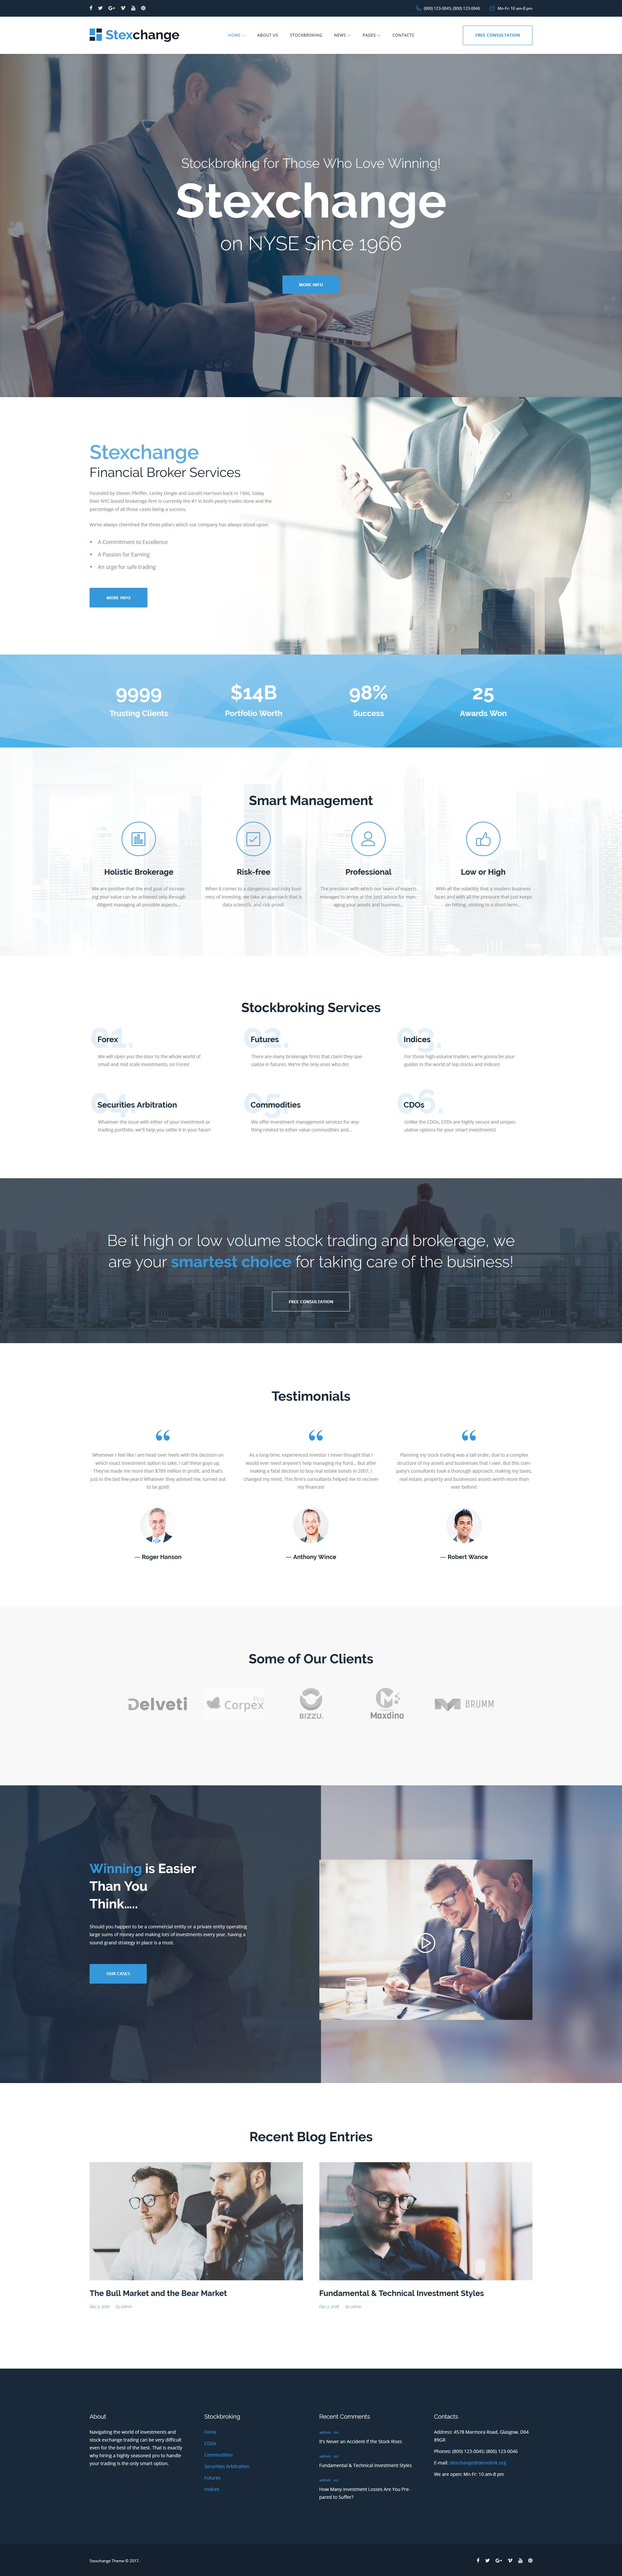 Stexchange - Financial Broker Services Responsive WordPress Theme - screenshot